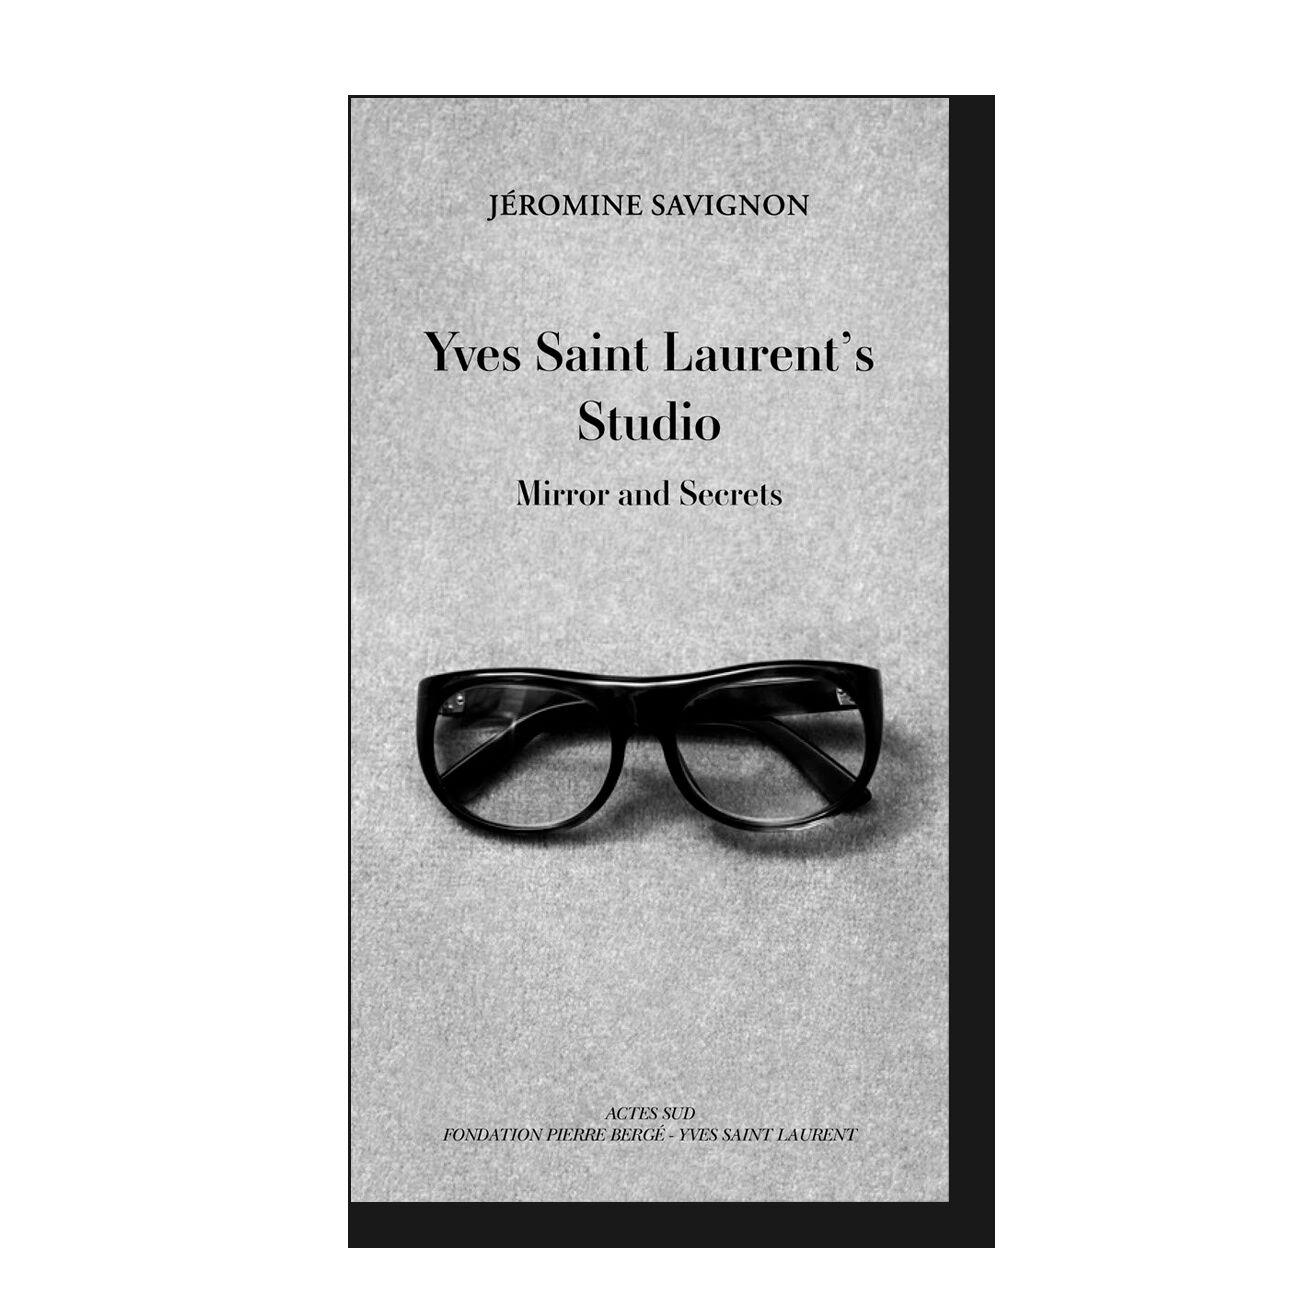 Yves Saint Laurent's Studio